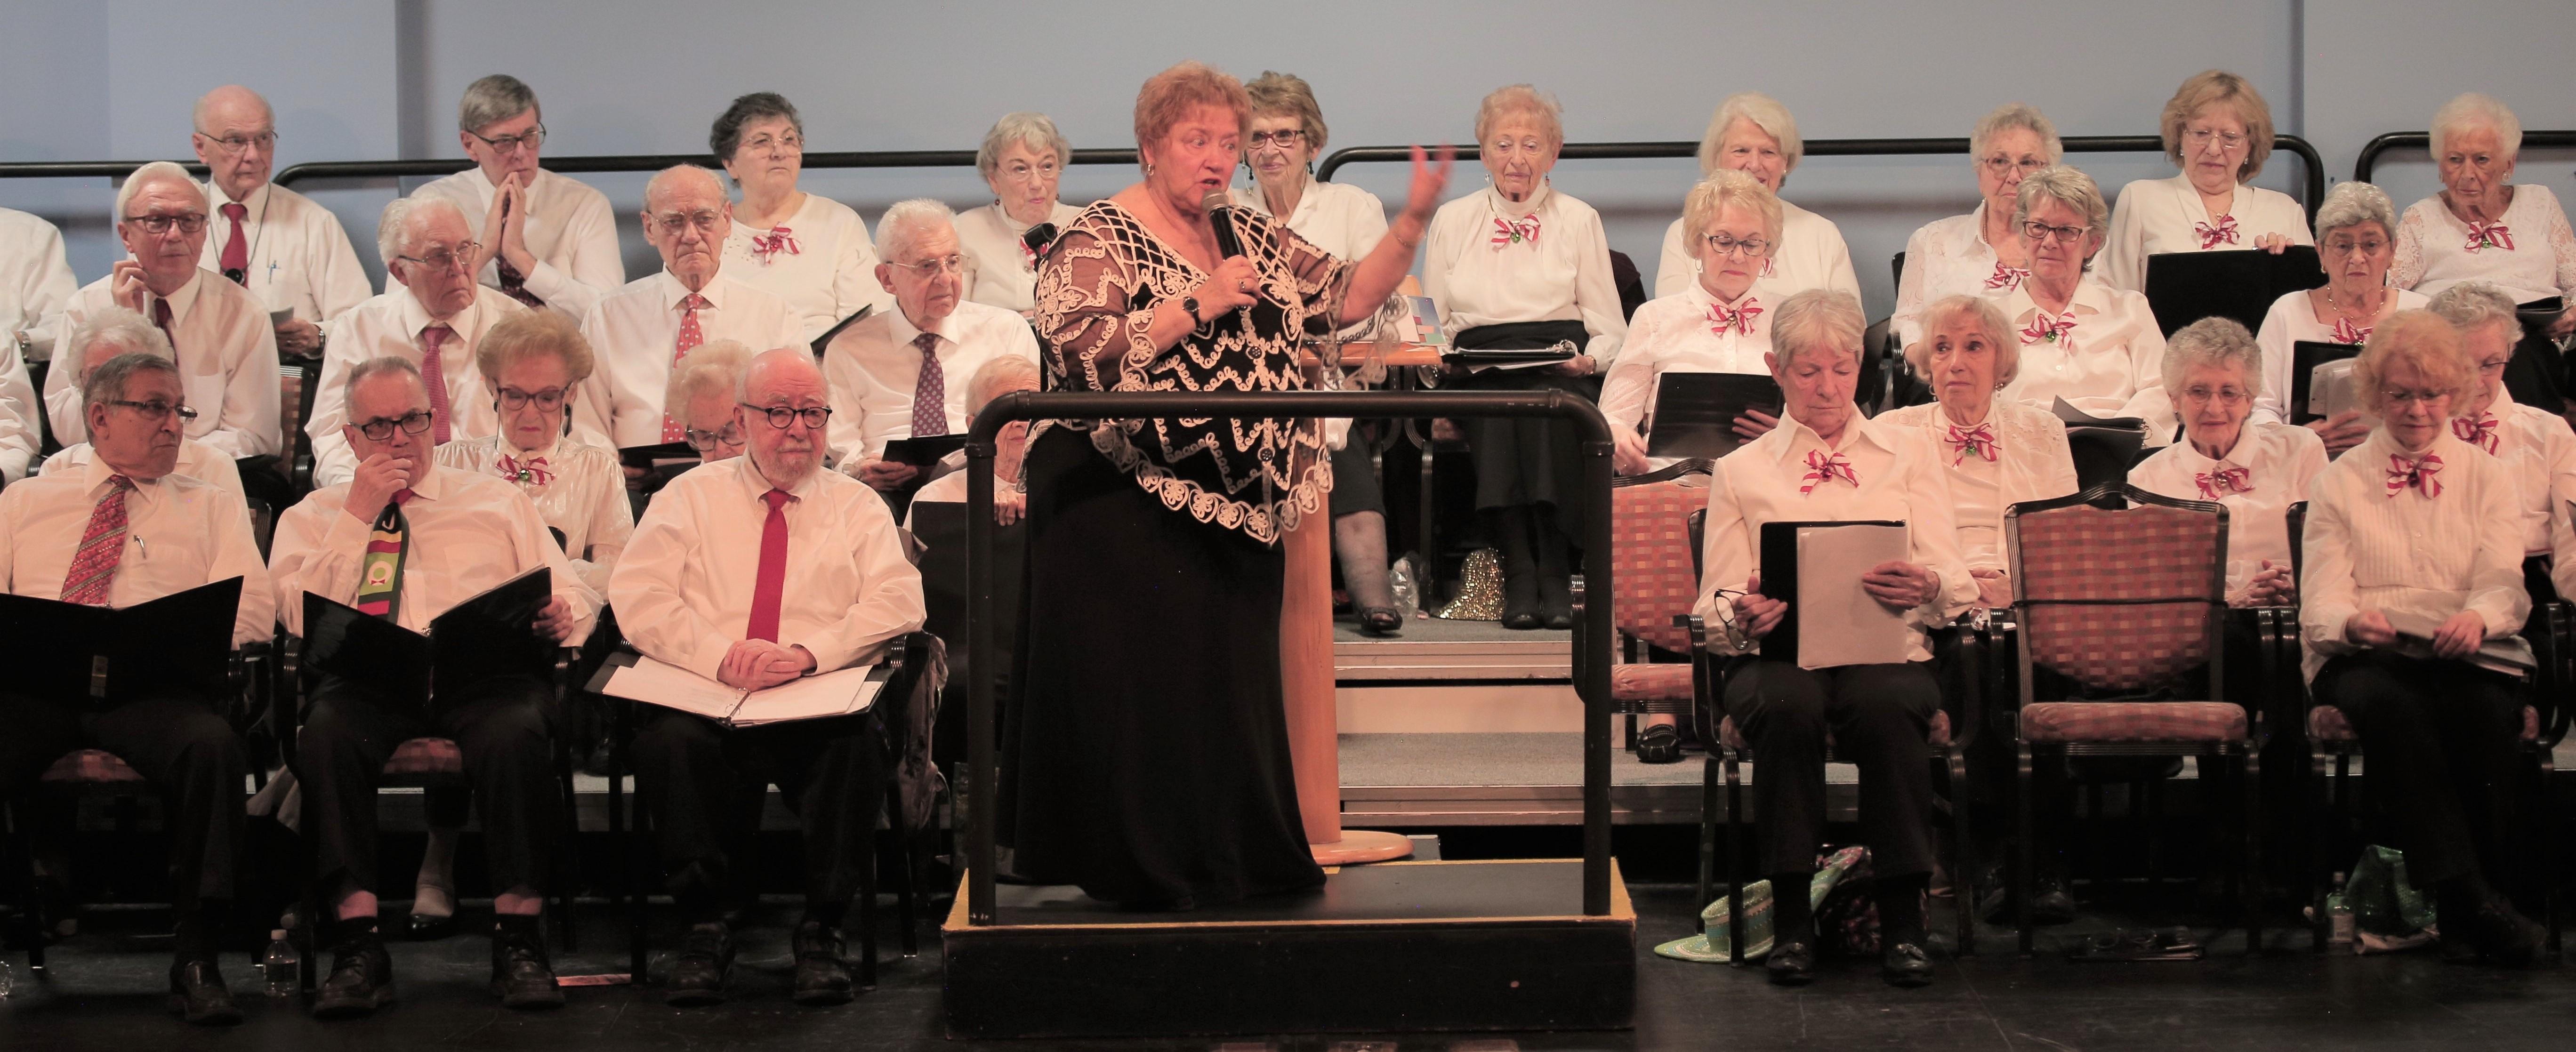 Cedar Crest Singers Perform Holiday Concert